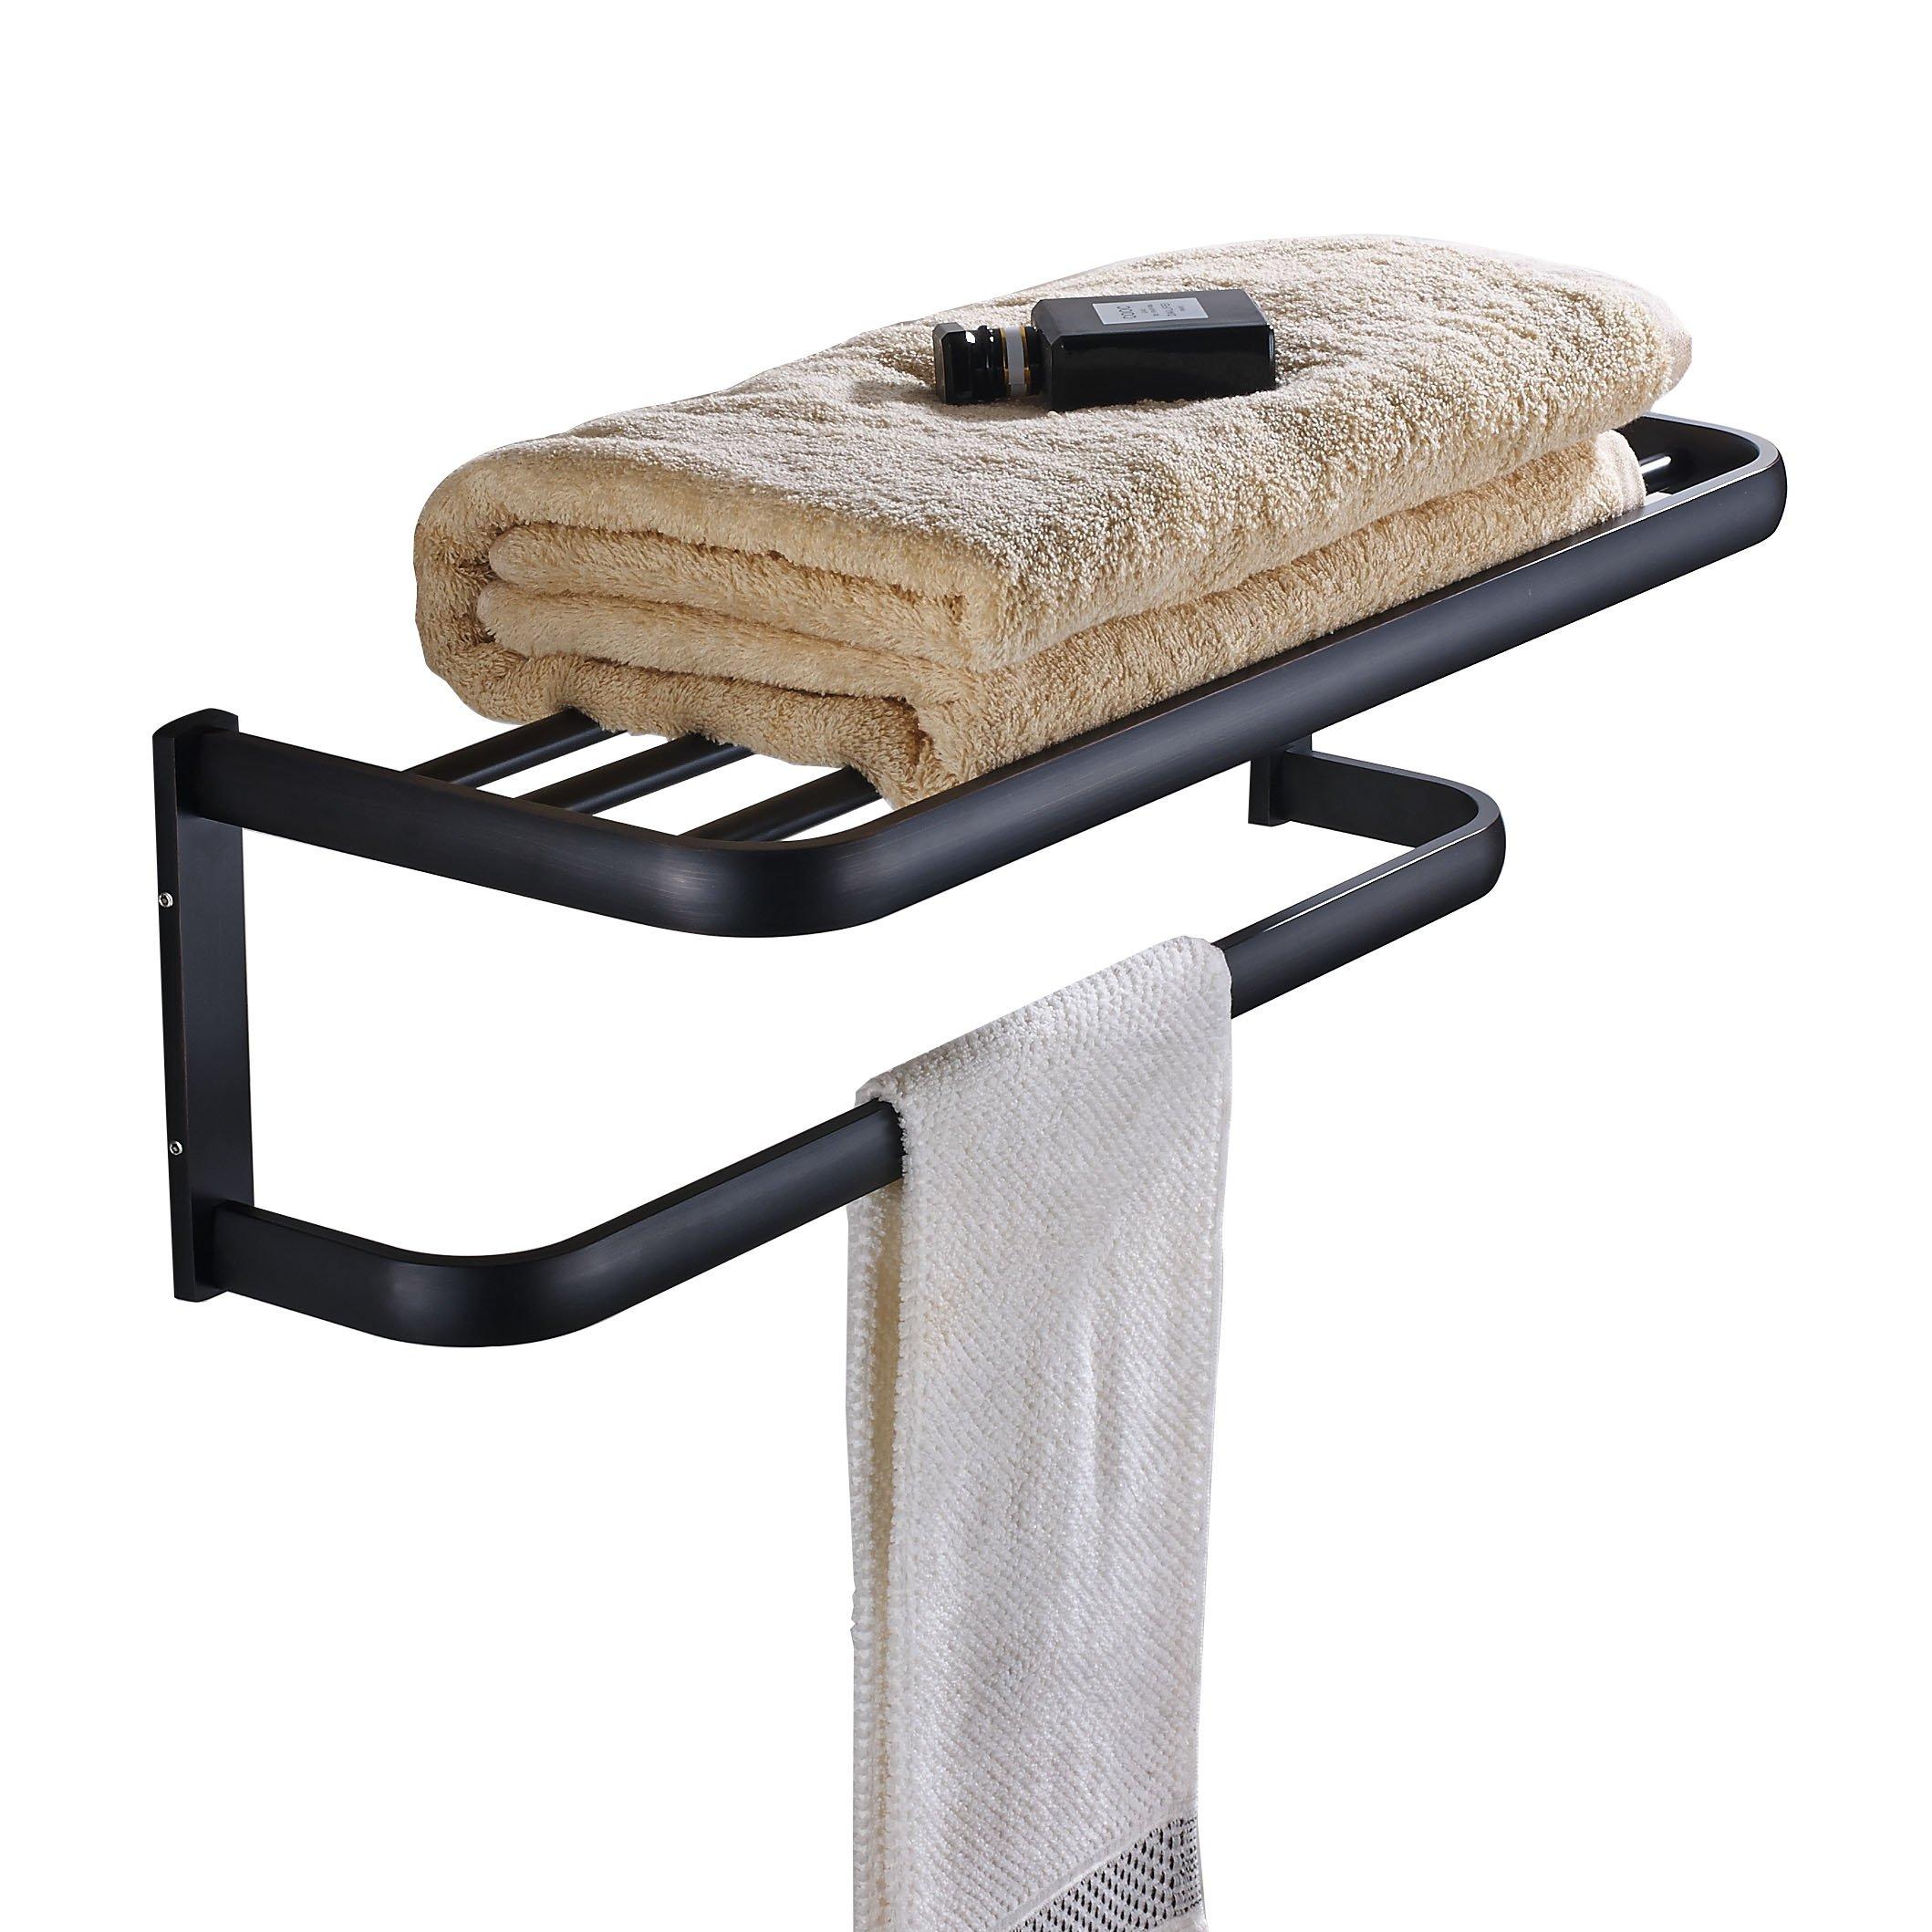 Rozin Oil Rubbed Bronze Bath Towel Holder Shelf Wall Mounted Towel Rack